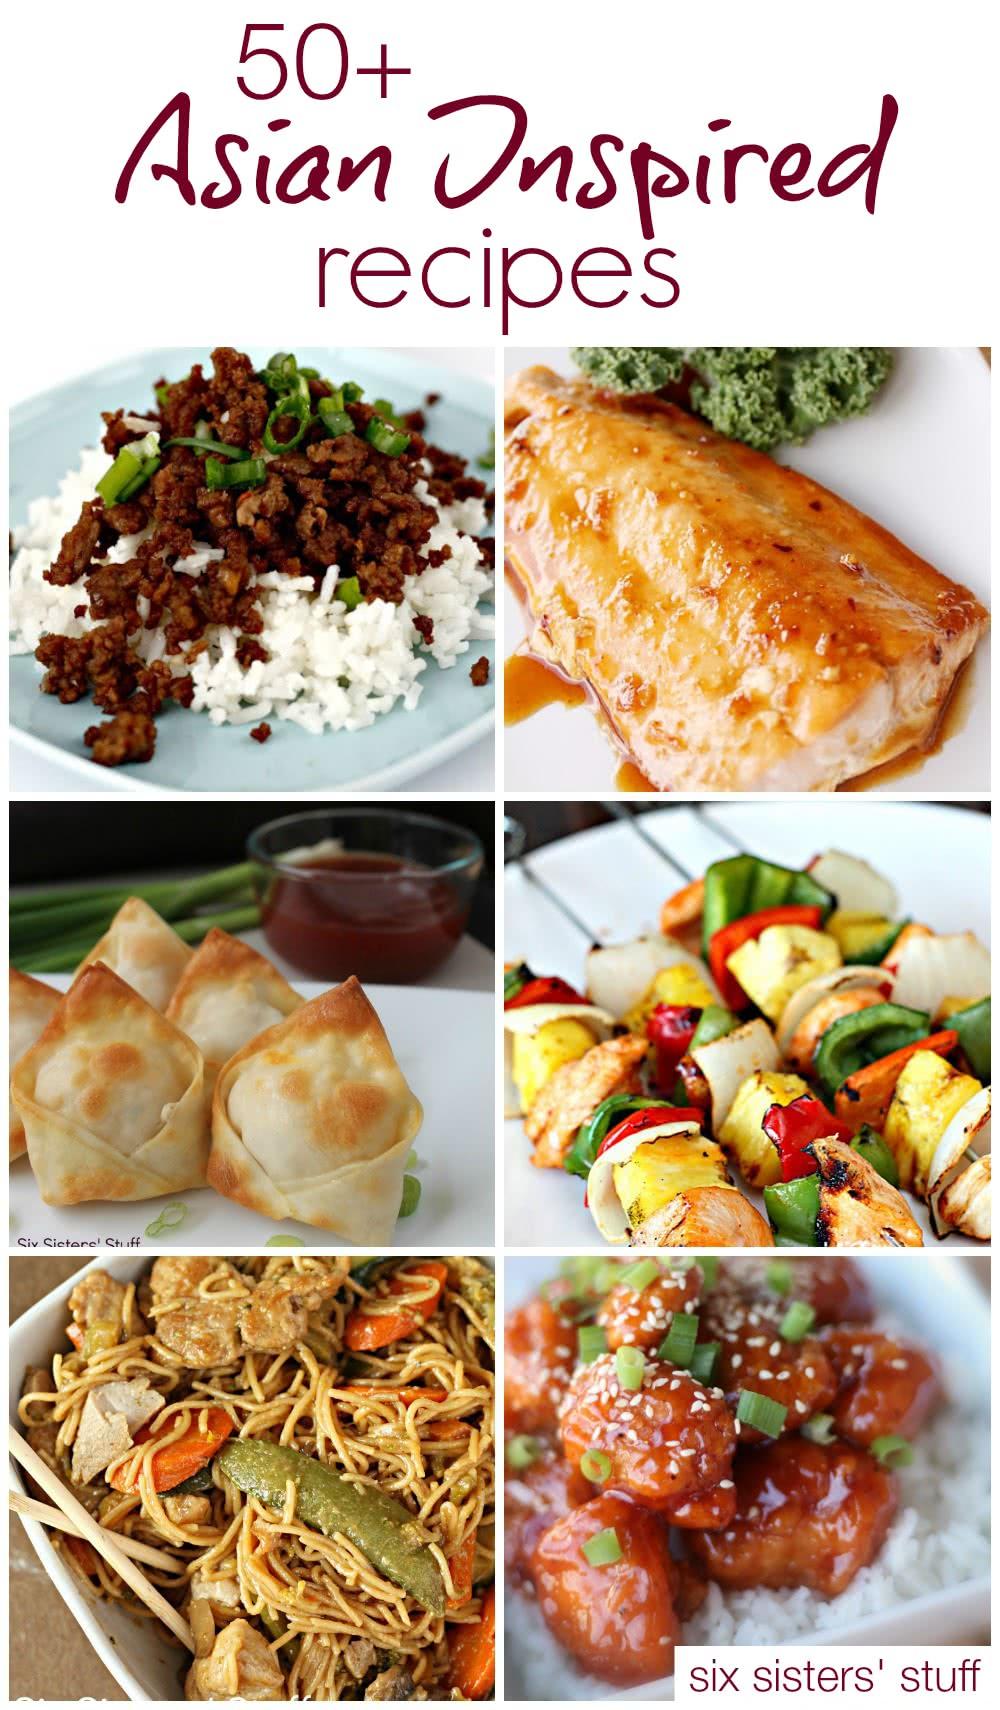 50+ Asian Inspired Recipes